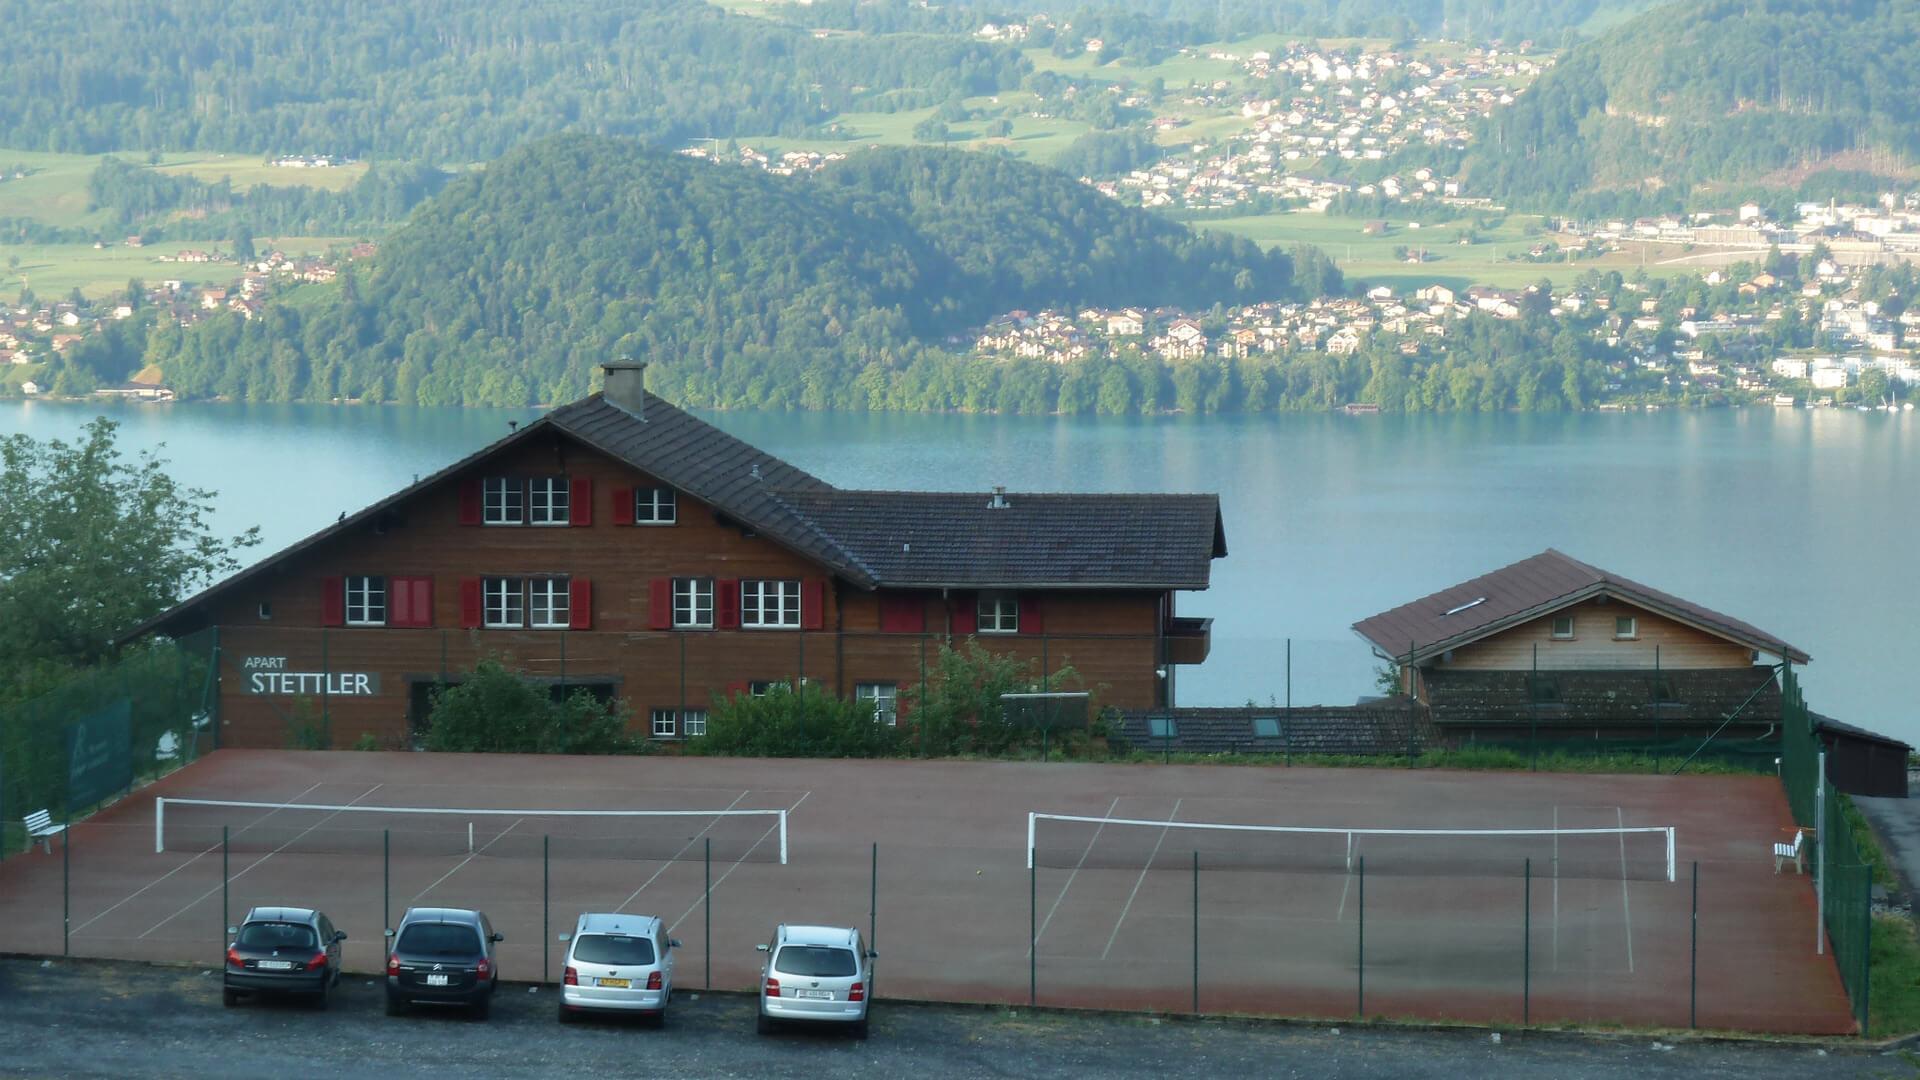 sigriswil-tennisplatz-sommer